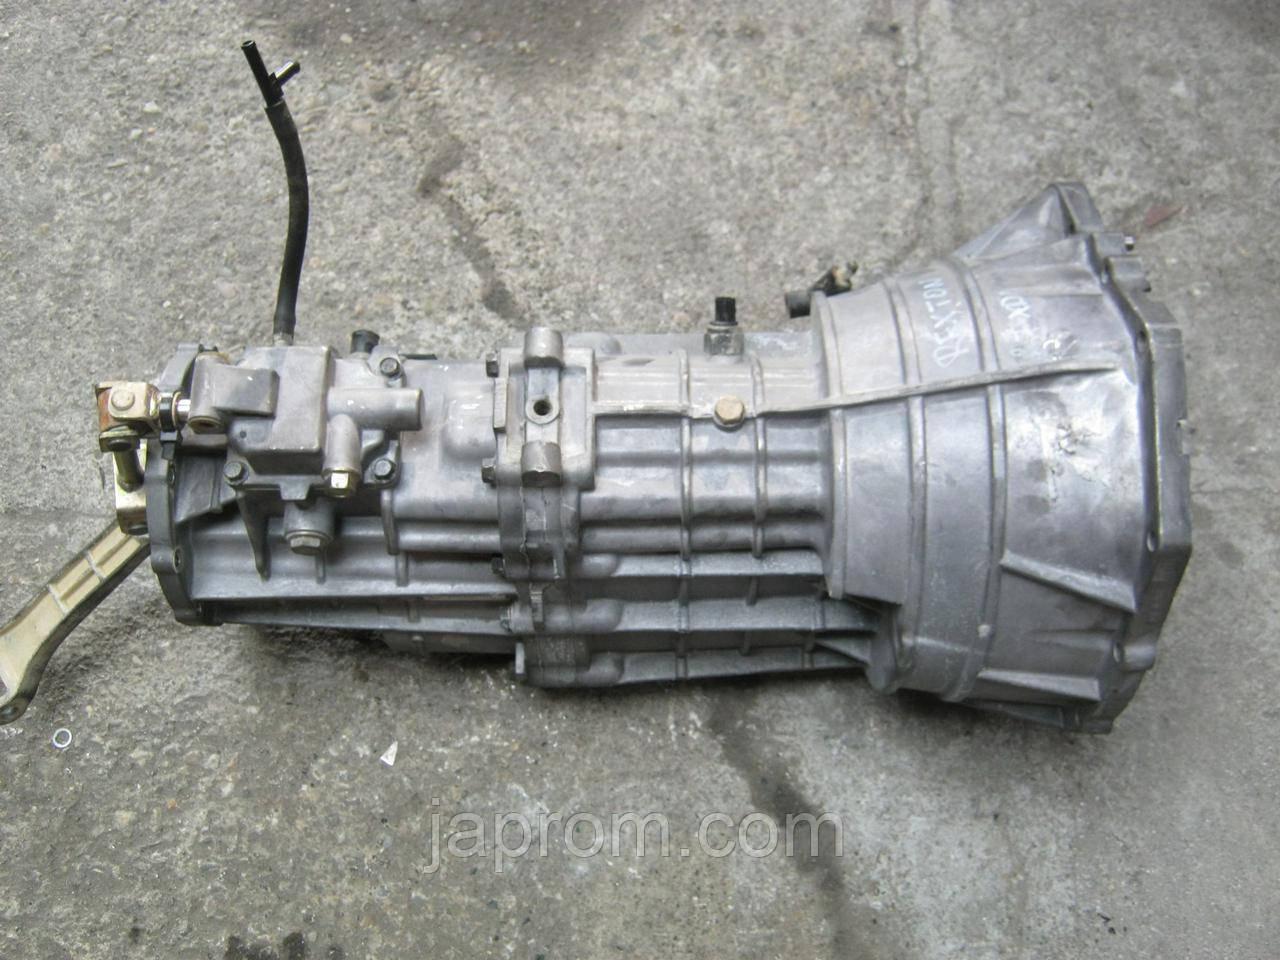 МКПП механічна коробка передач SsangYong Rexton 2.7 XDI G31020-08106